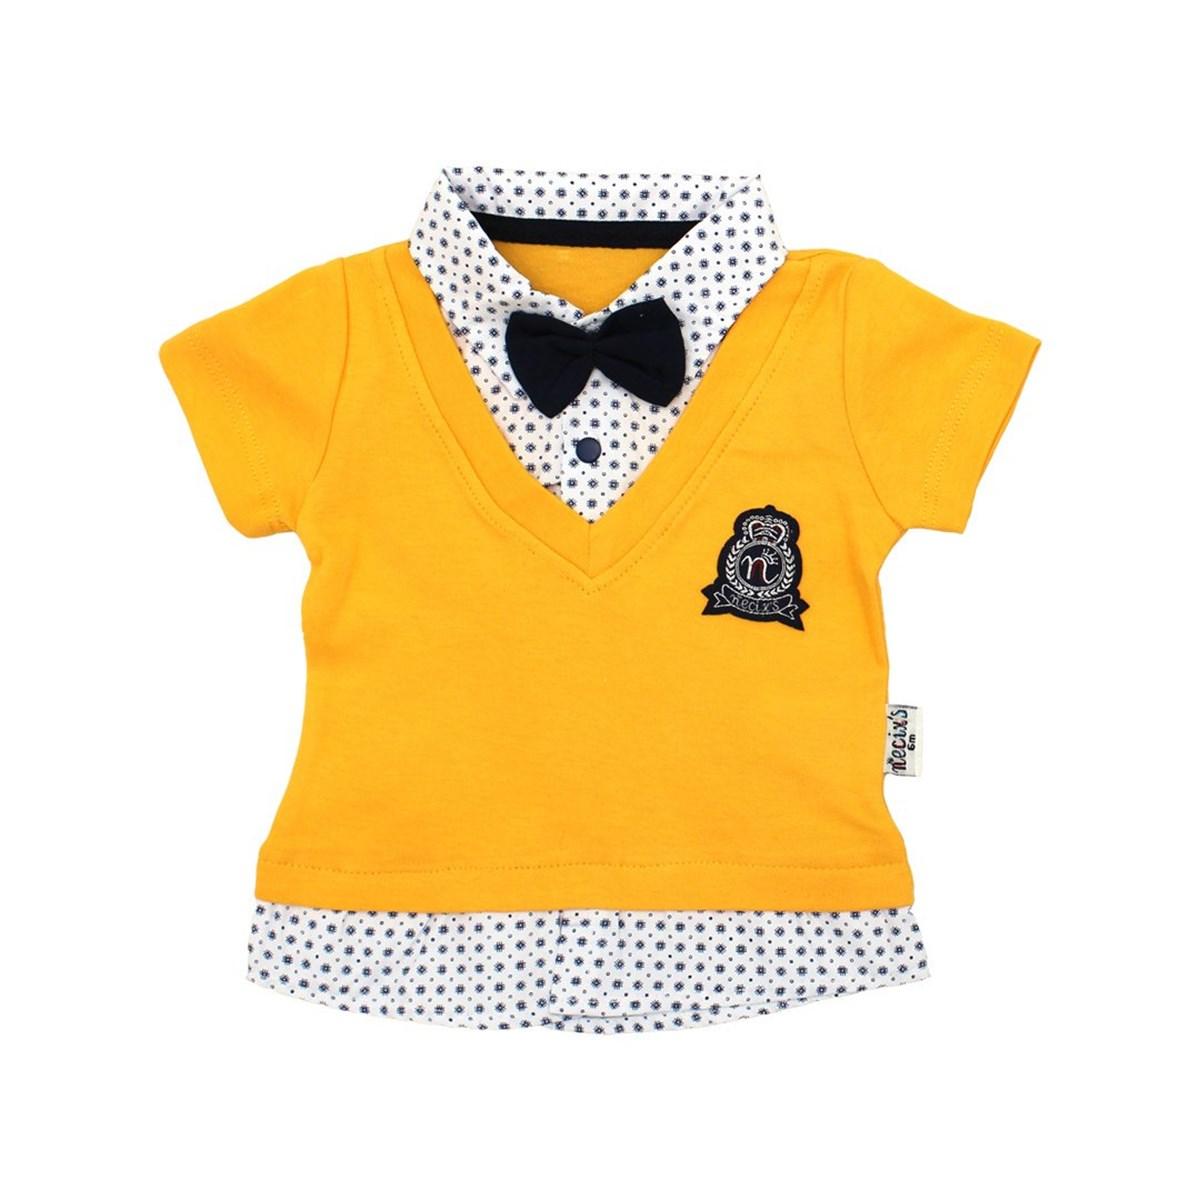 Baby's Summer Yellow T-shirt & Shorts Set